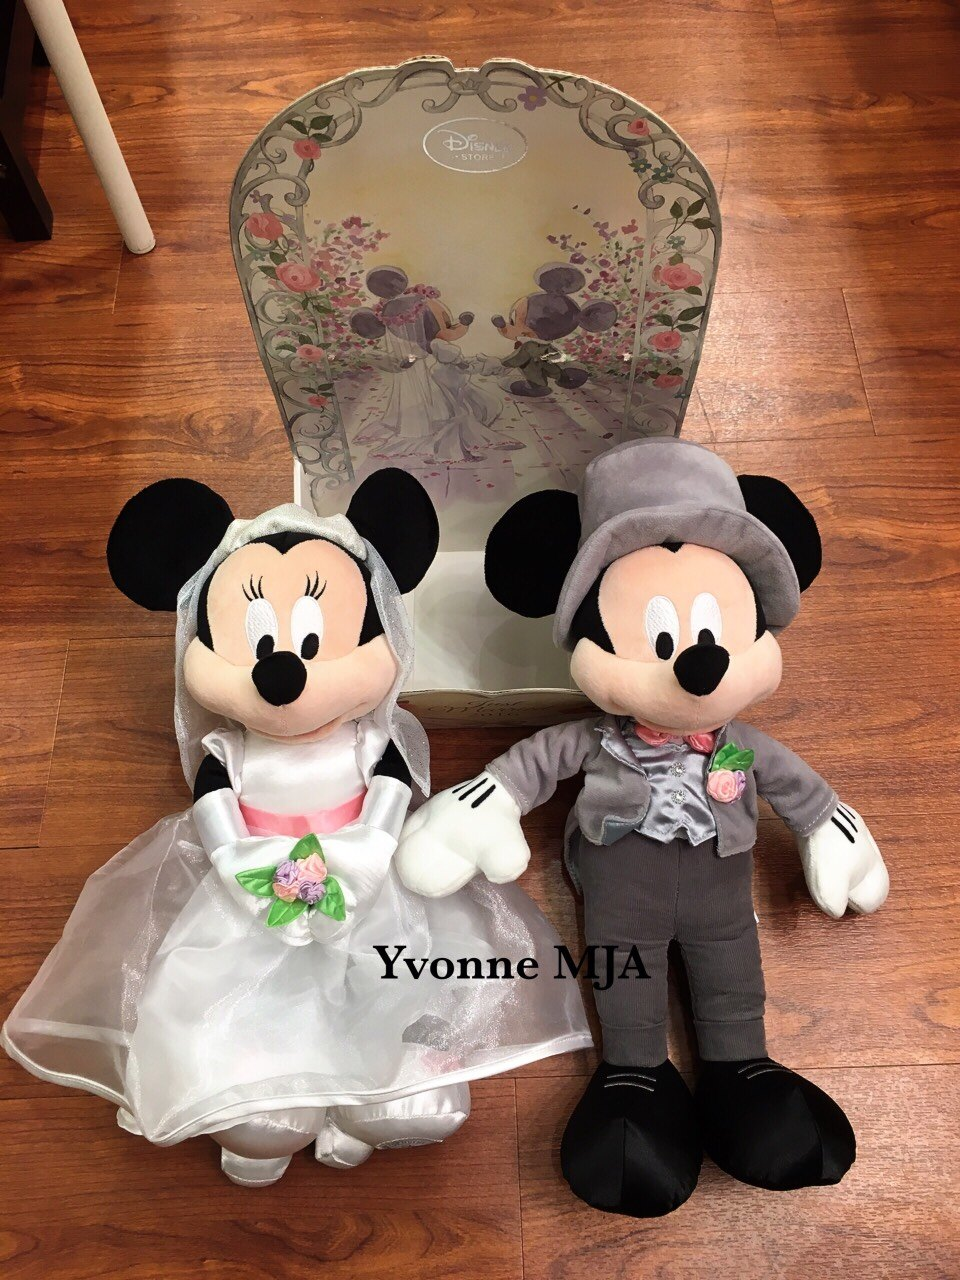 Yvonne MJA 英國代購空運 英國迪士尼商店限定 精裝版米奇米妮結婚大娃套組 (結婚不能單賣喔)